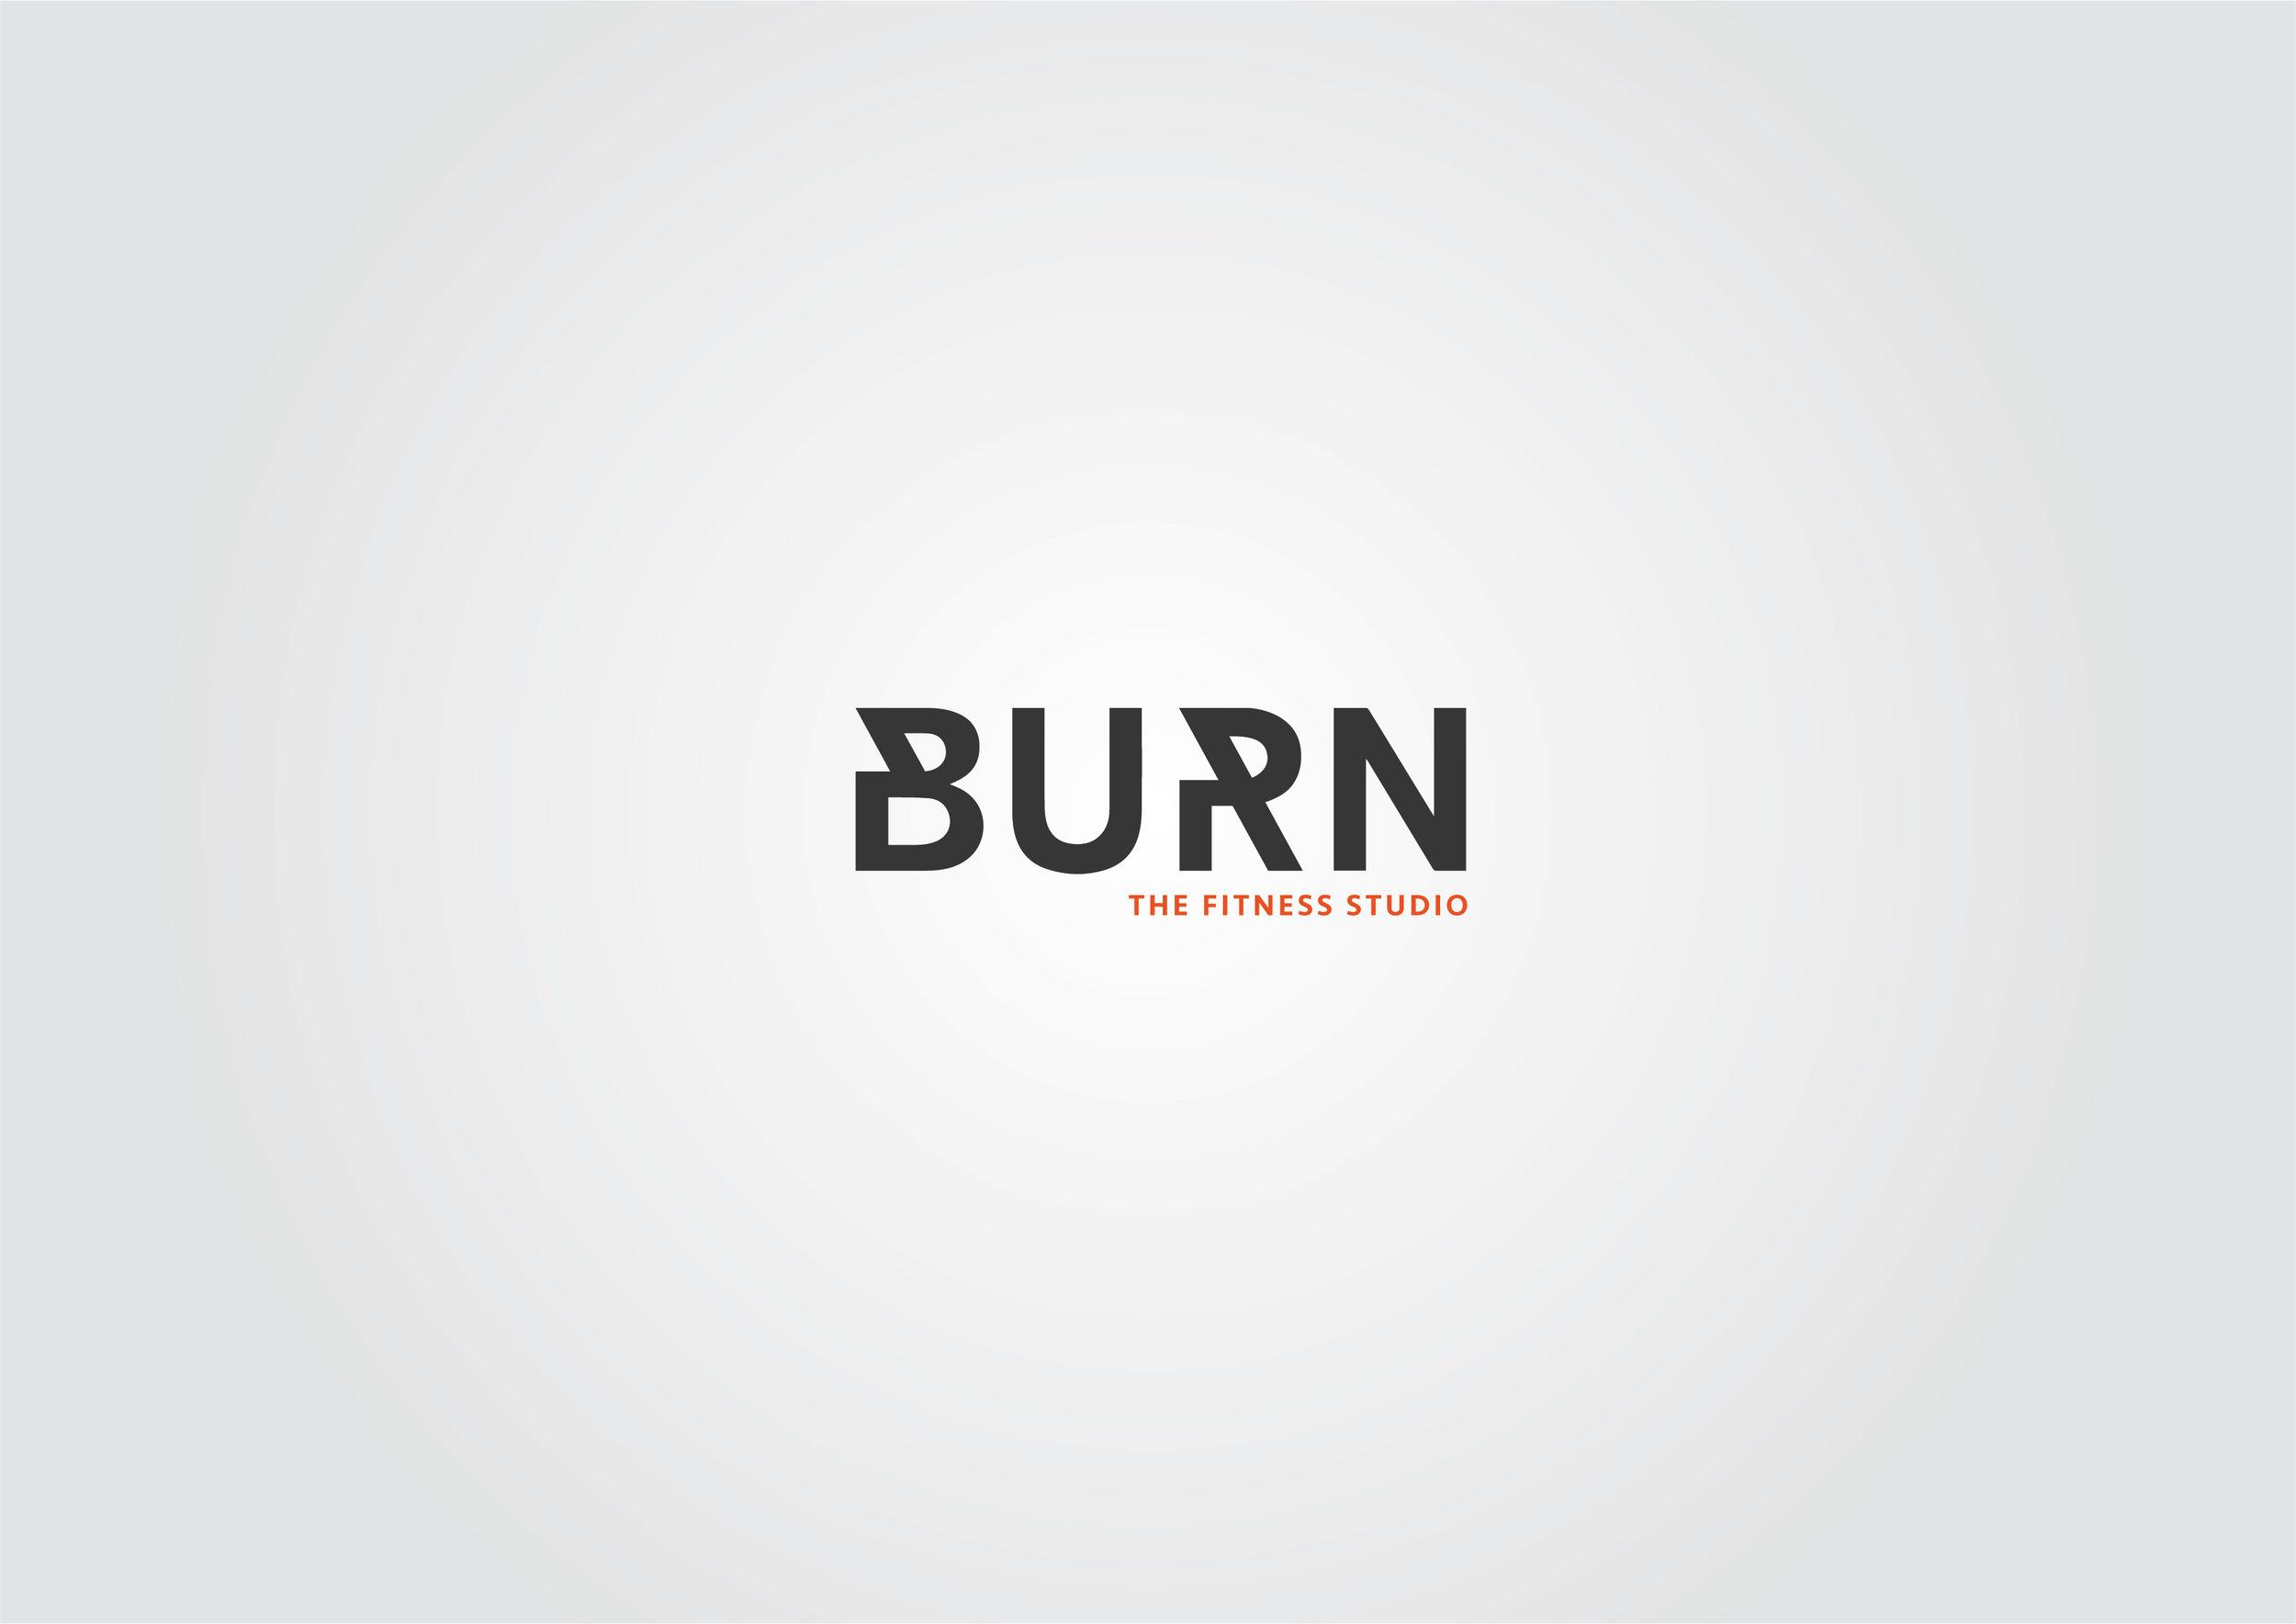 Burn-01.jpg